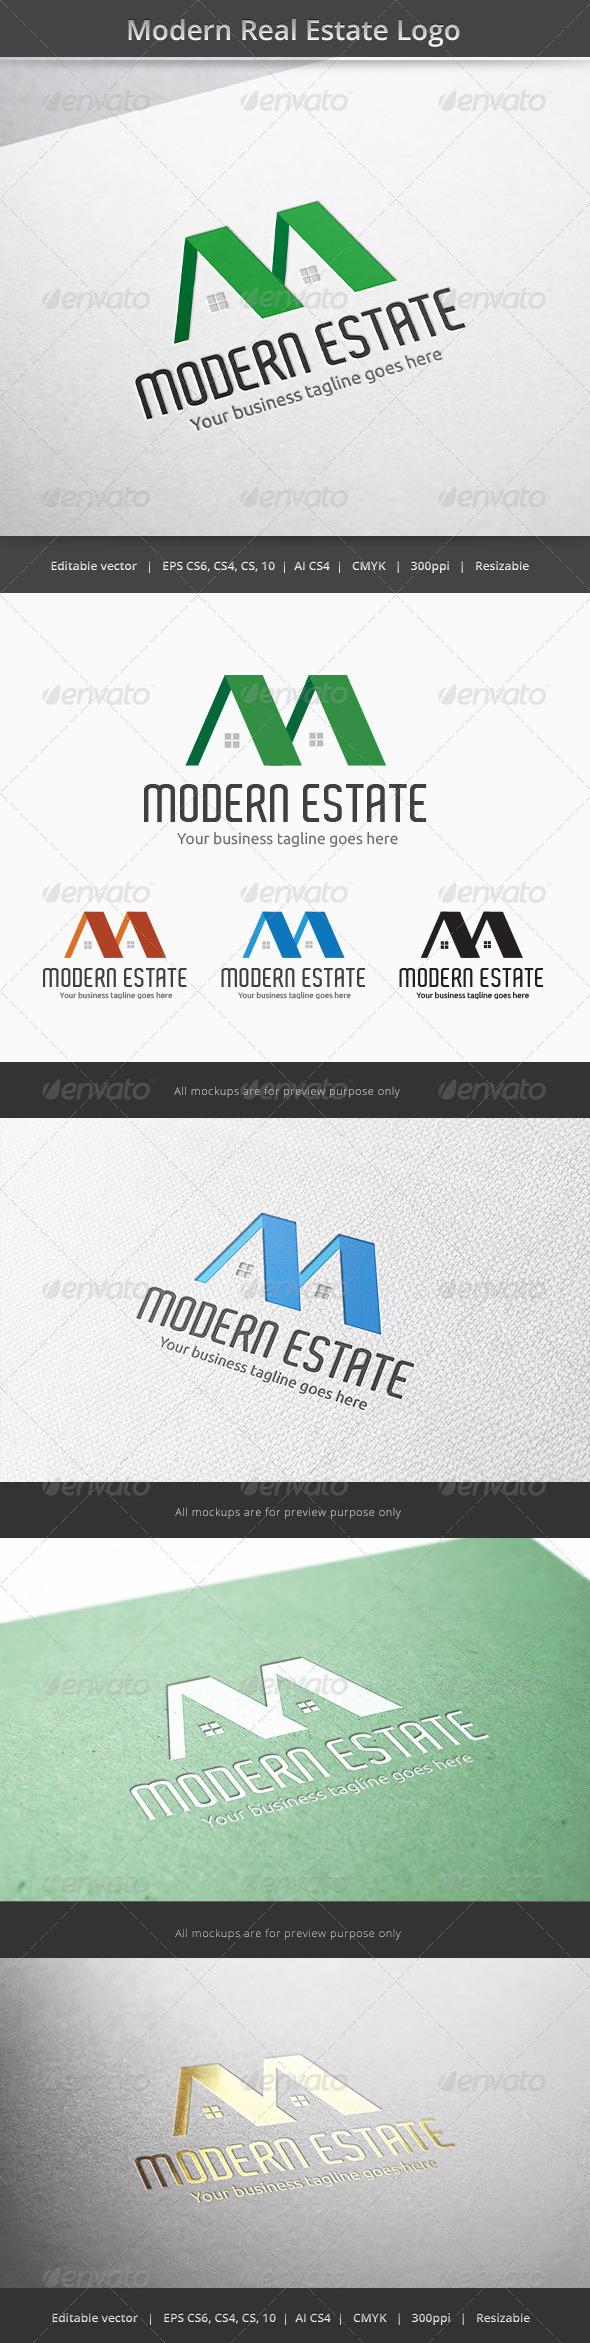 GraphicRiver Modern Real Estate Logo 6234226